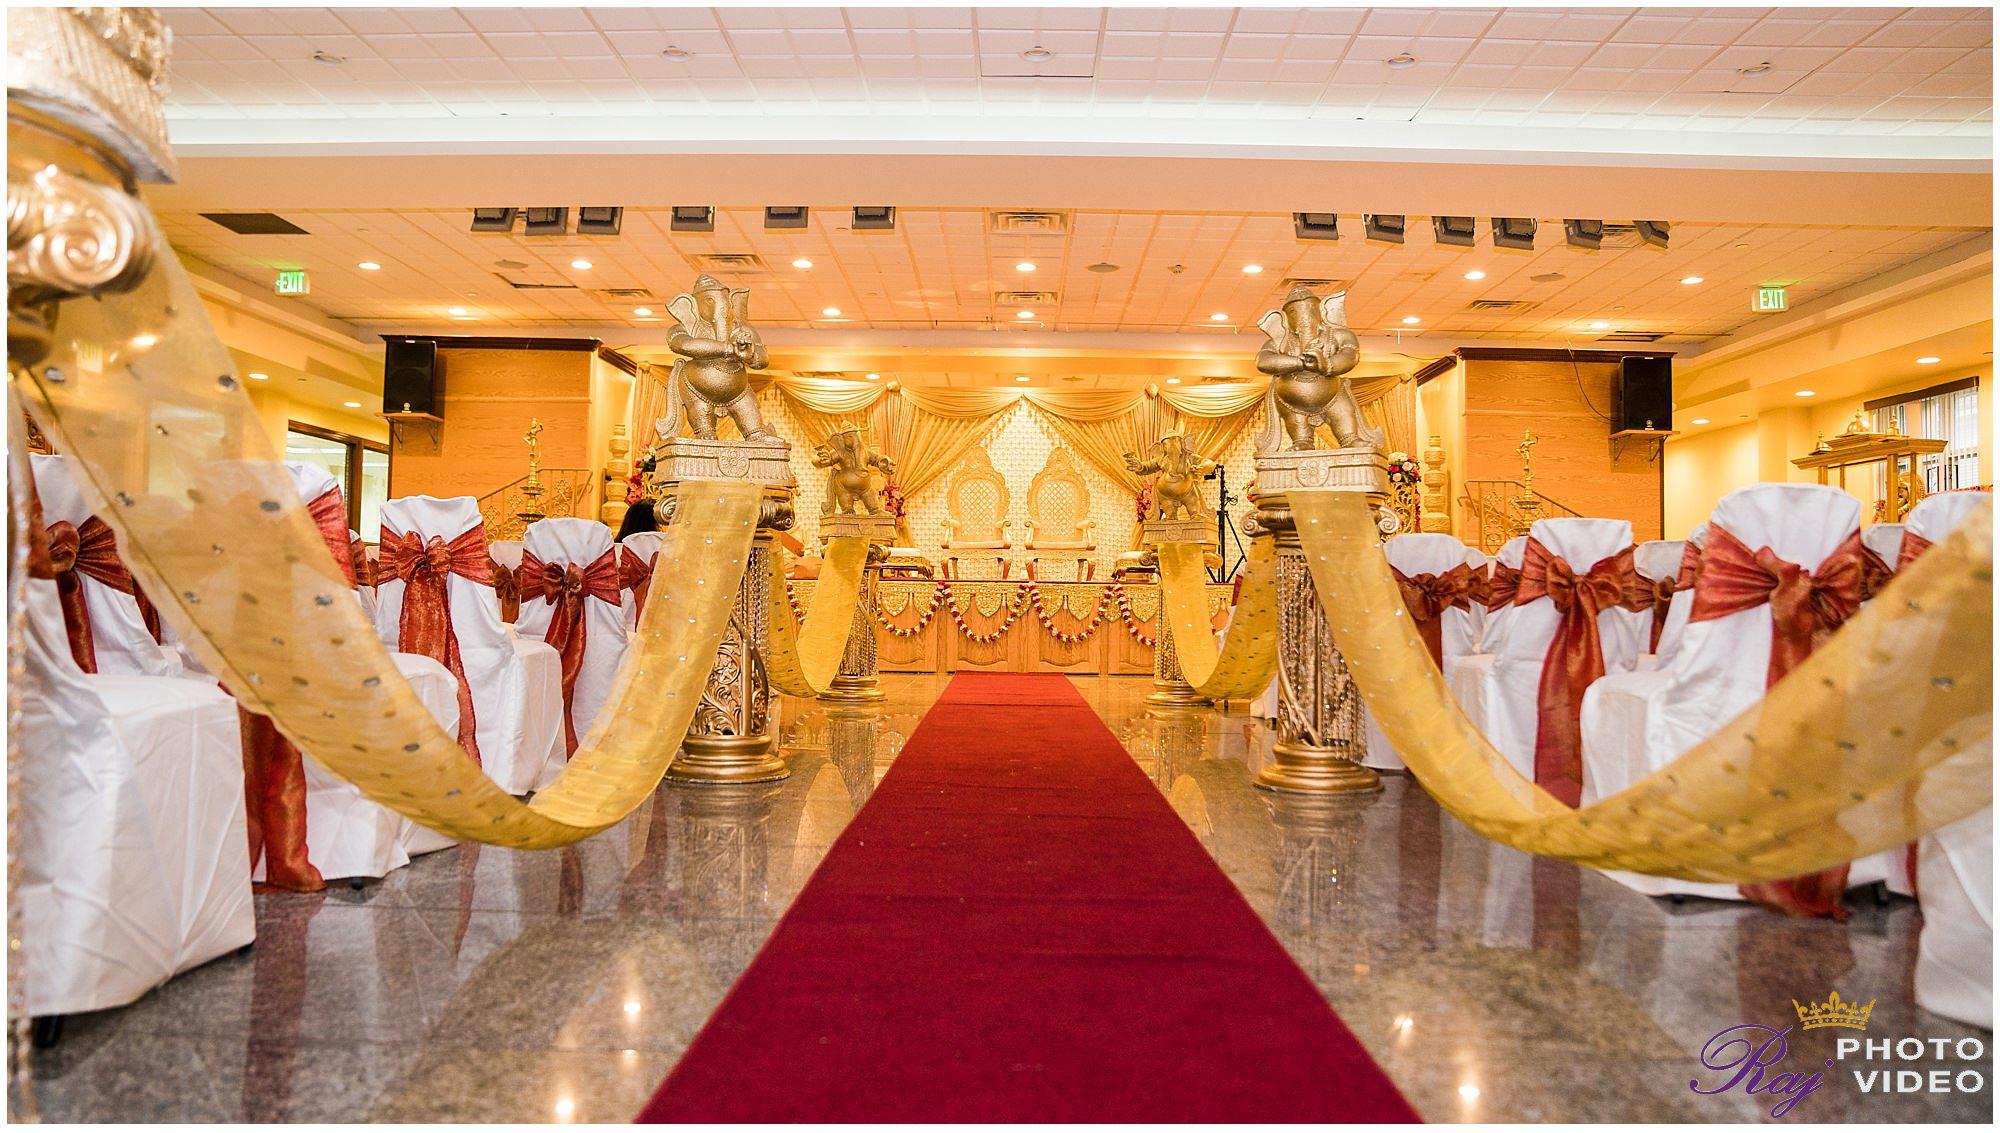 Sri-Guruvaayoorappan-Temple-Marlboro-NJ-Indian-Wedding-Chiyomi-Scott-00004.jpg